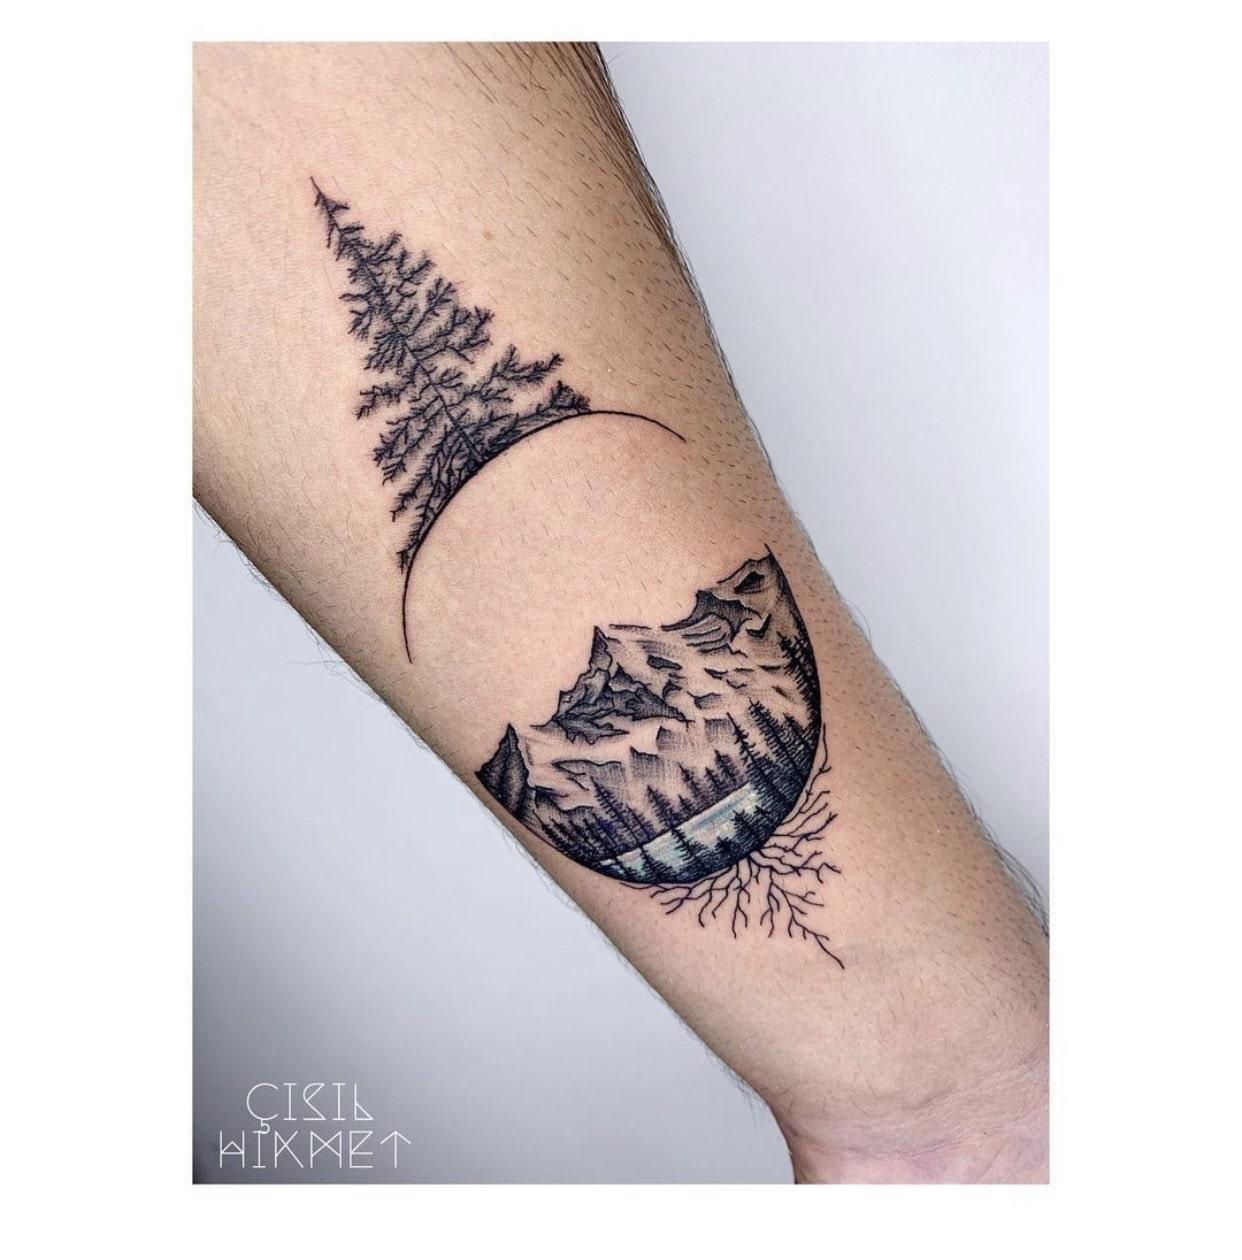 çisil-hikmet-tattoo-artist-mountains-lake